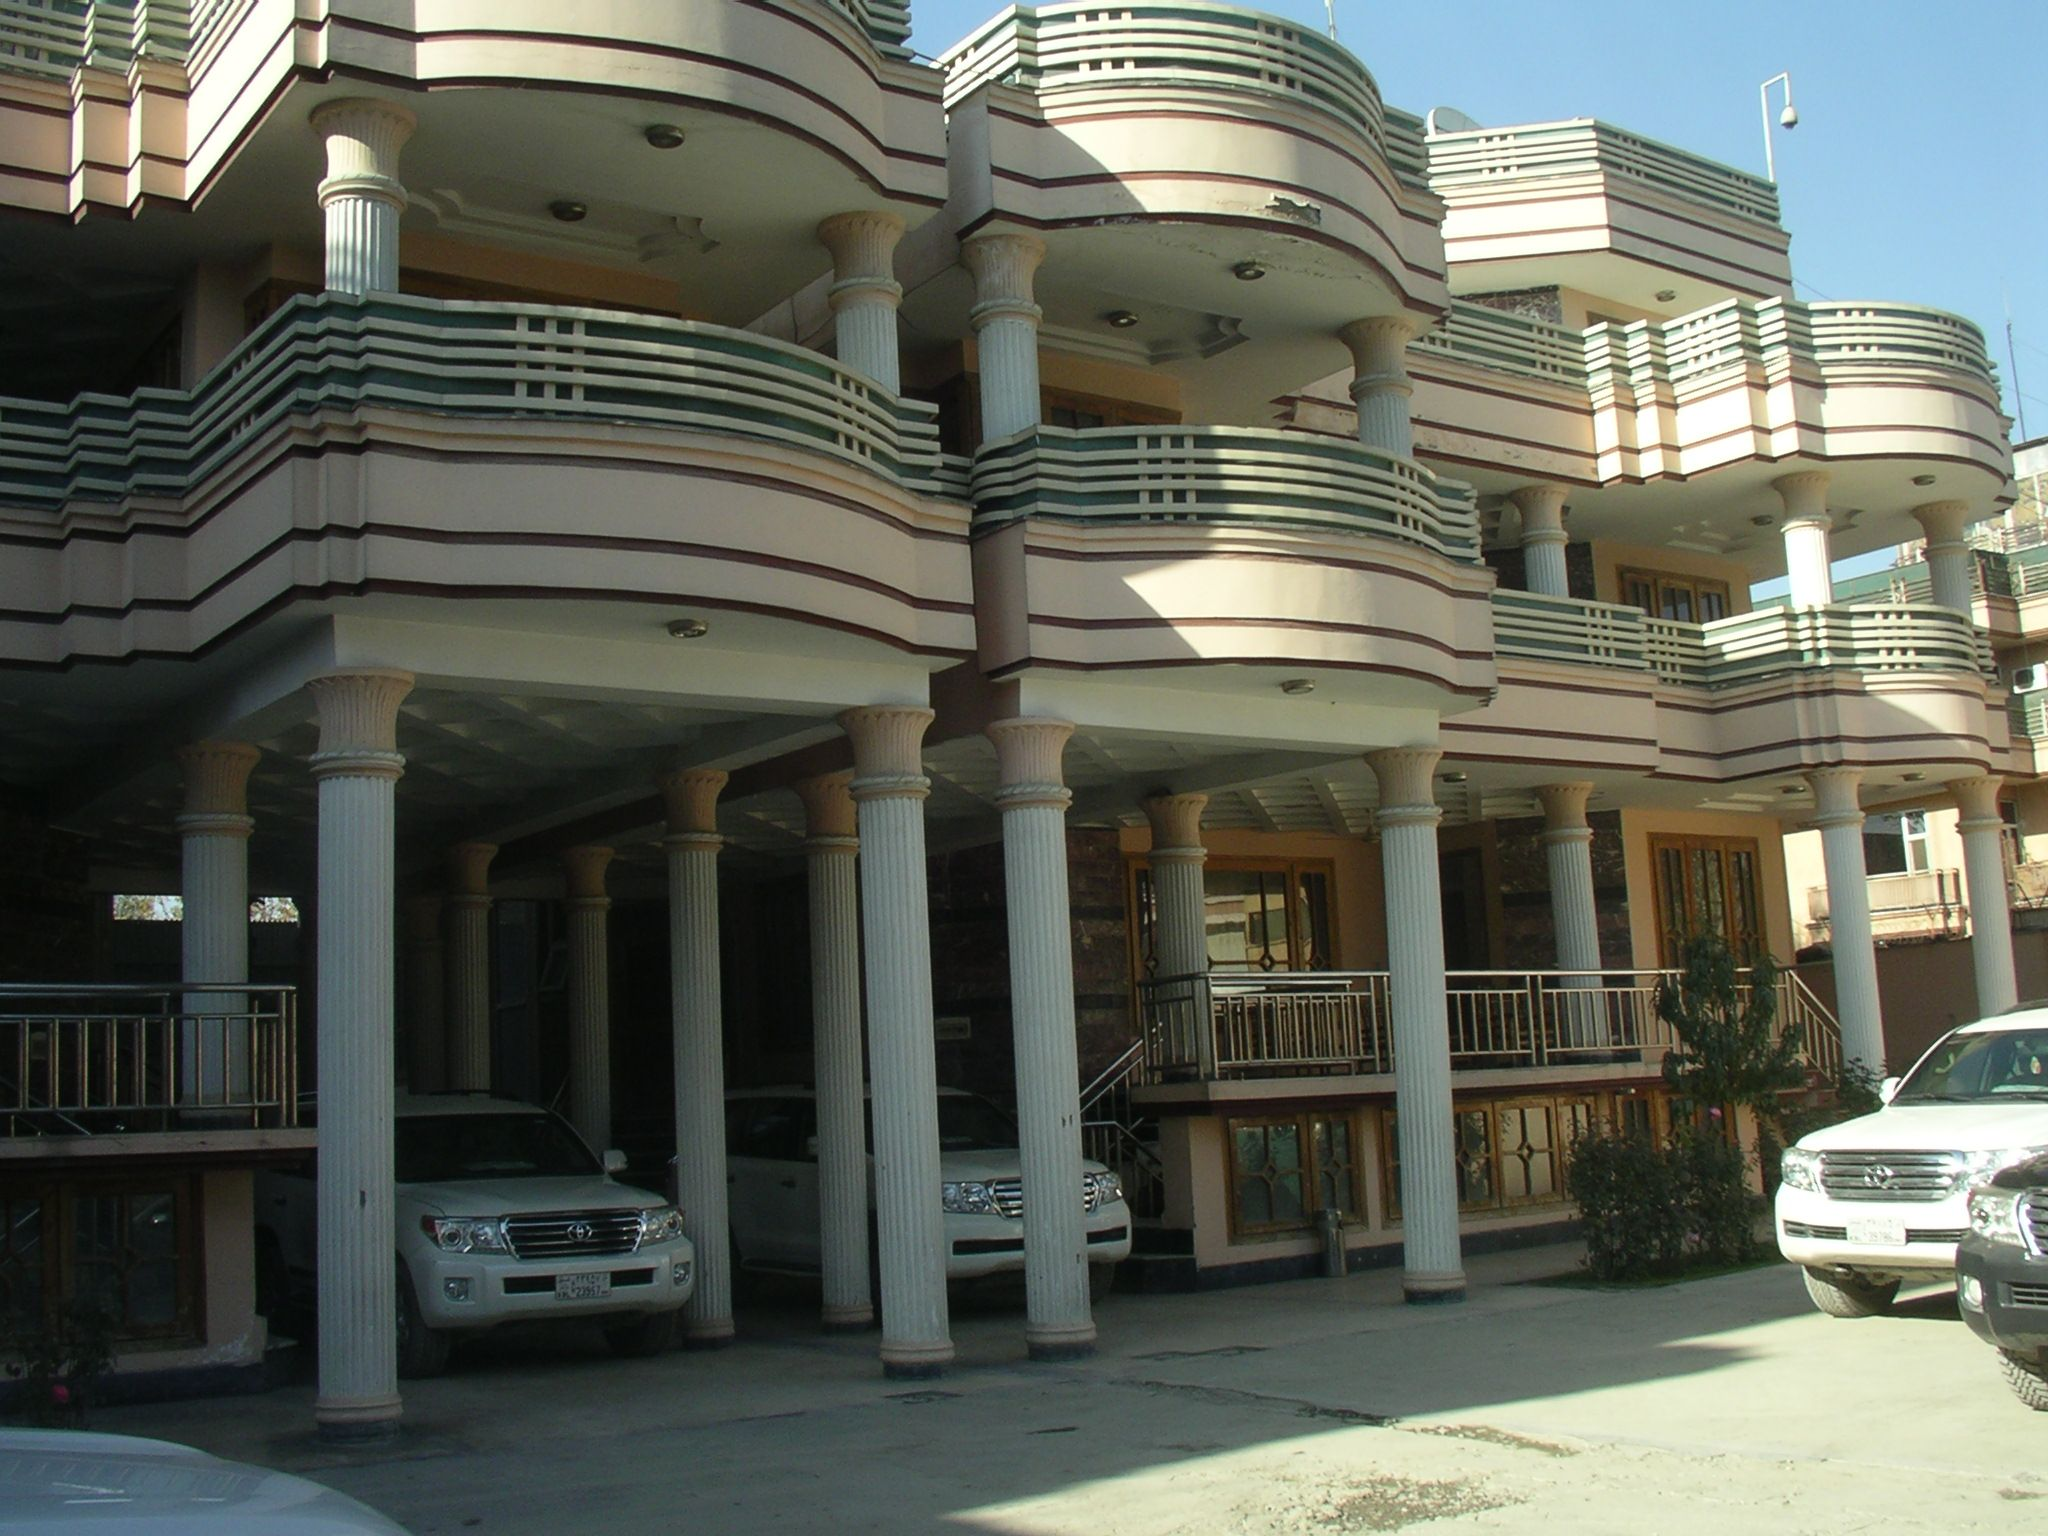 Defense Department Spent 150 Million On Villas Private